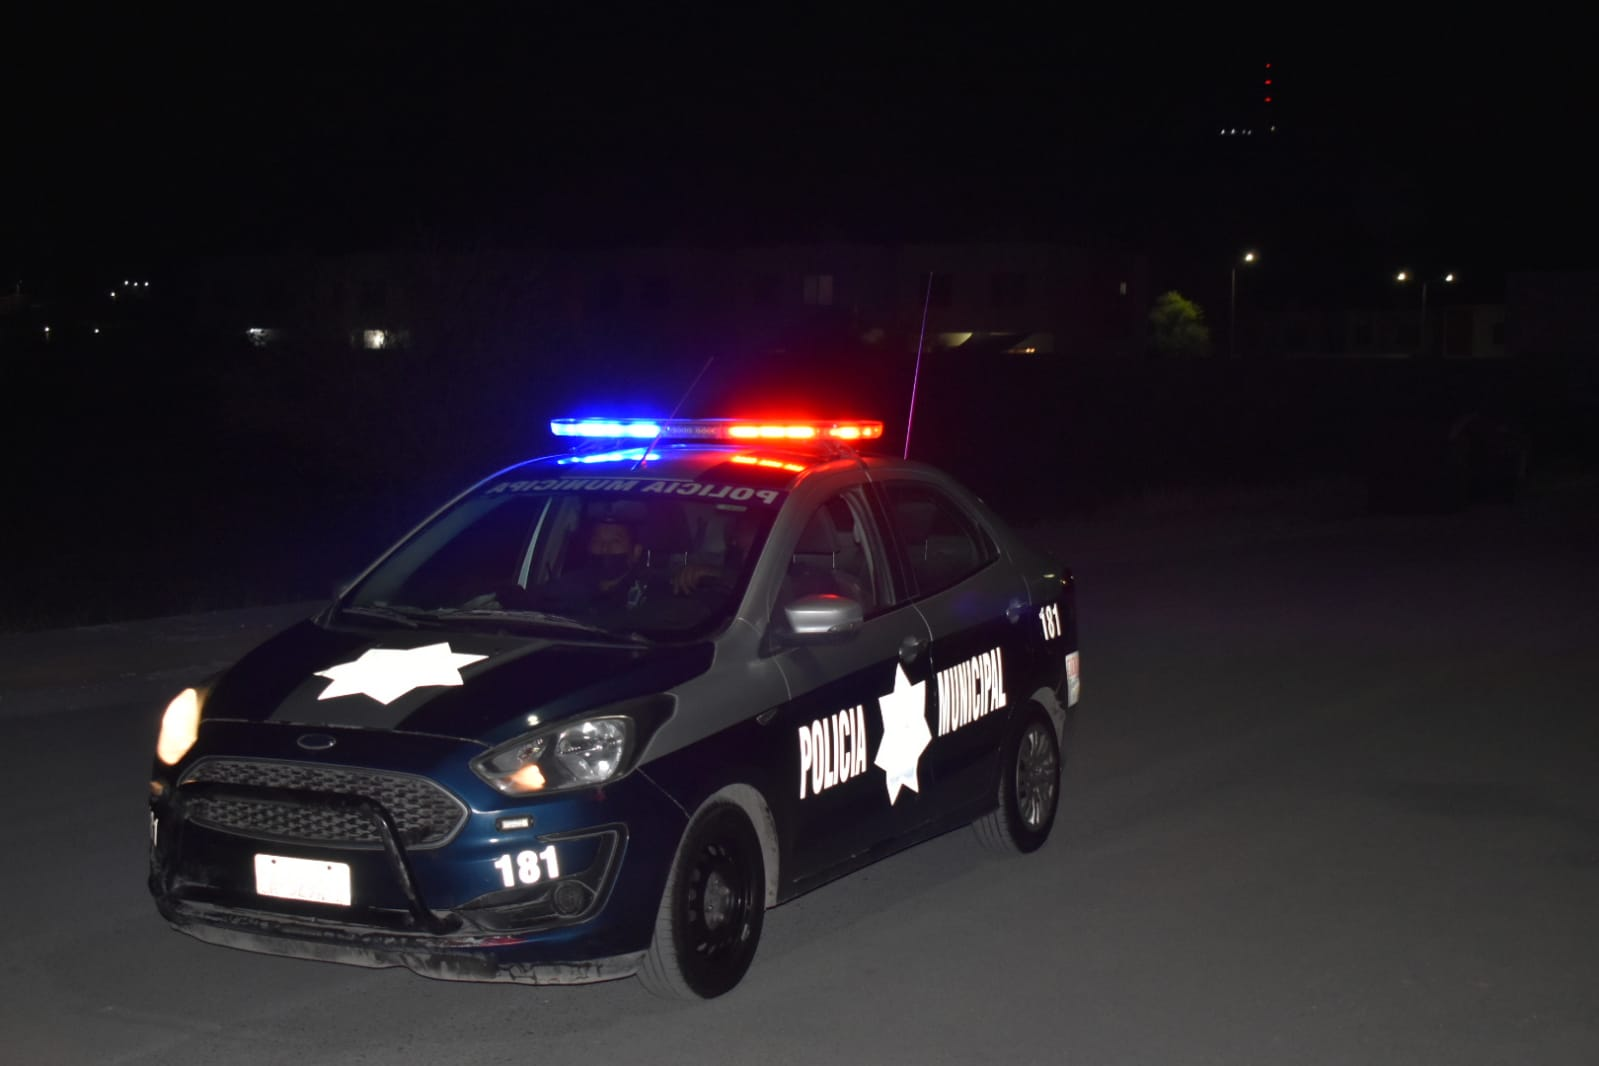 Tan solo en un fin de semana se reciben más de 50 reportes de vecinos ruidosos en Monclova